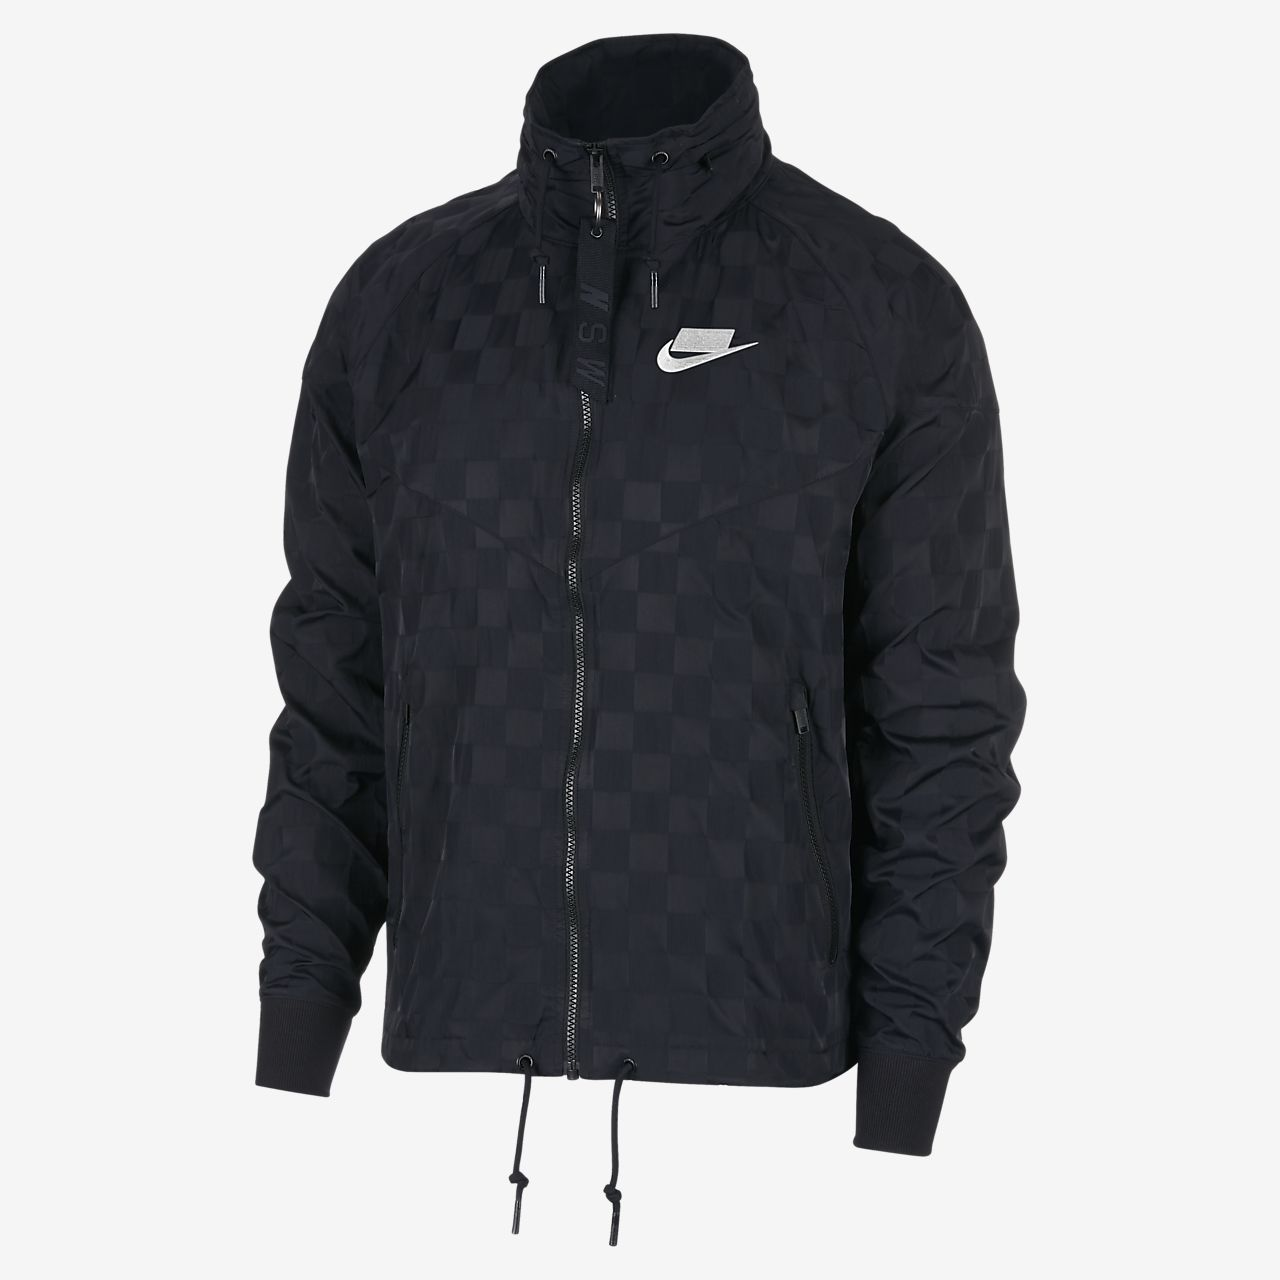 premium selection f6d34 de803 ... Jacka Nike Sportswear Windrunner NSW för män